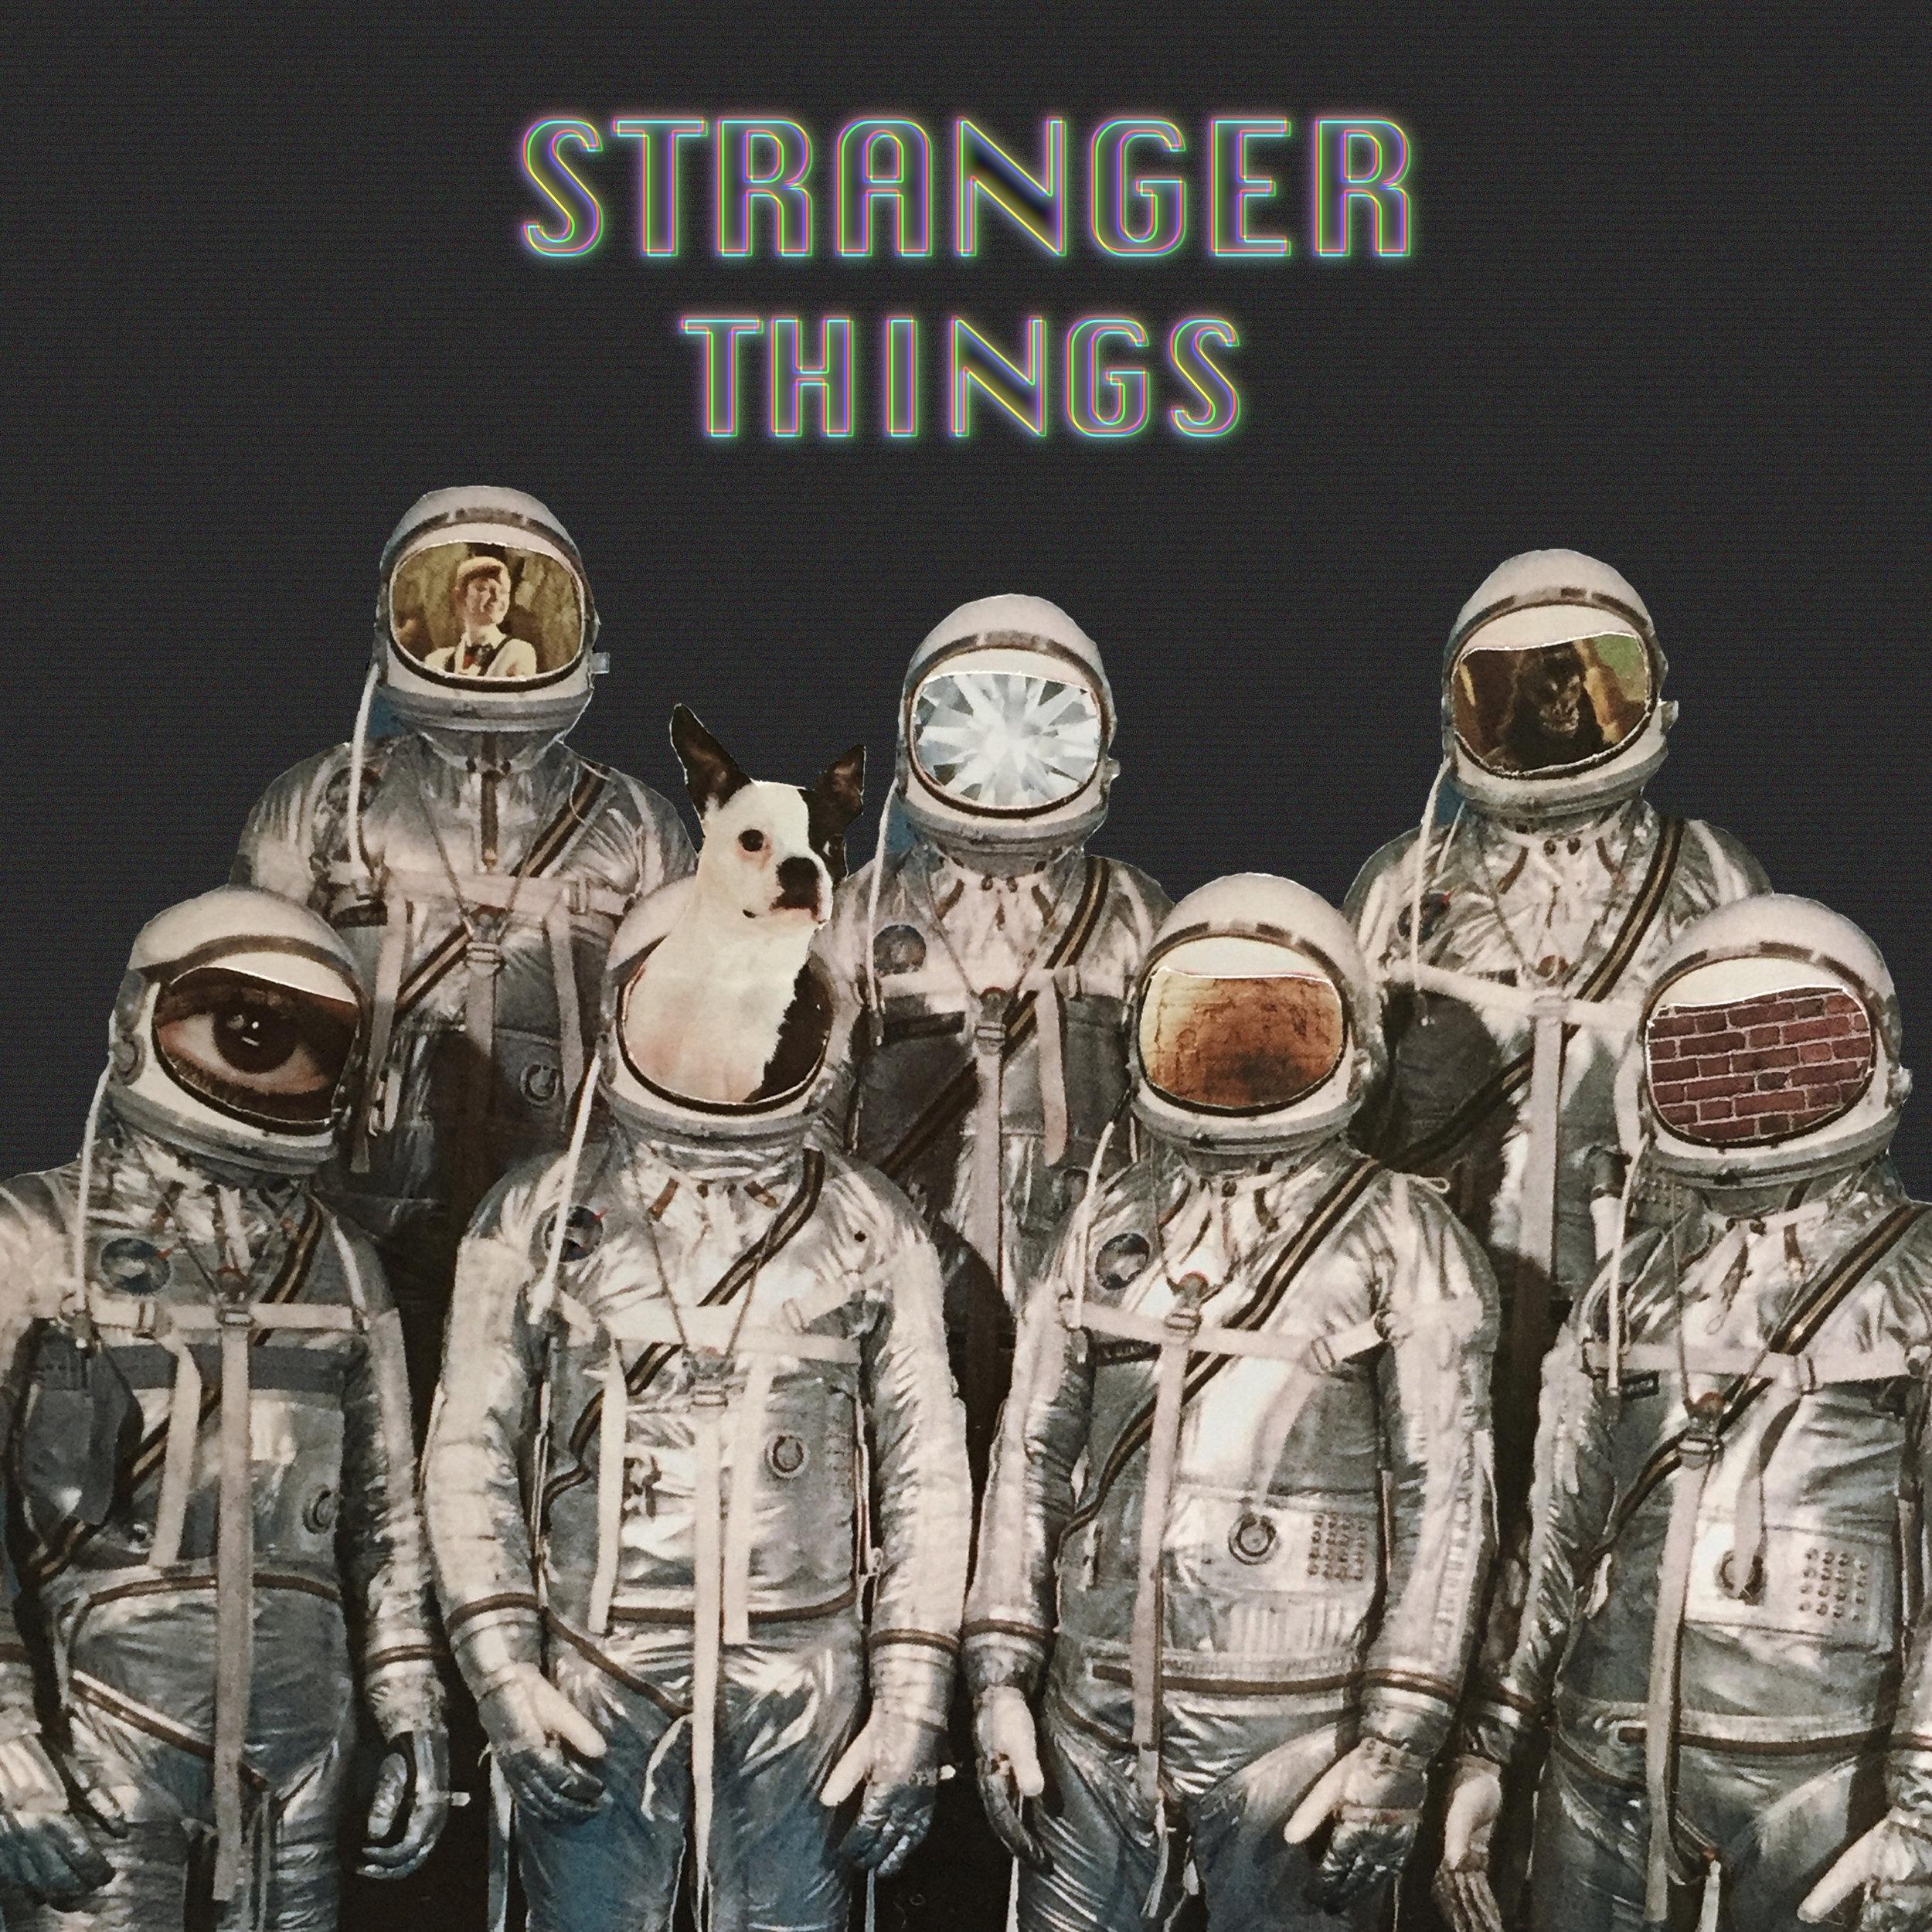 STRANGER THINGS - SINGLE